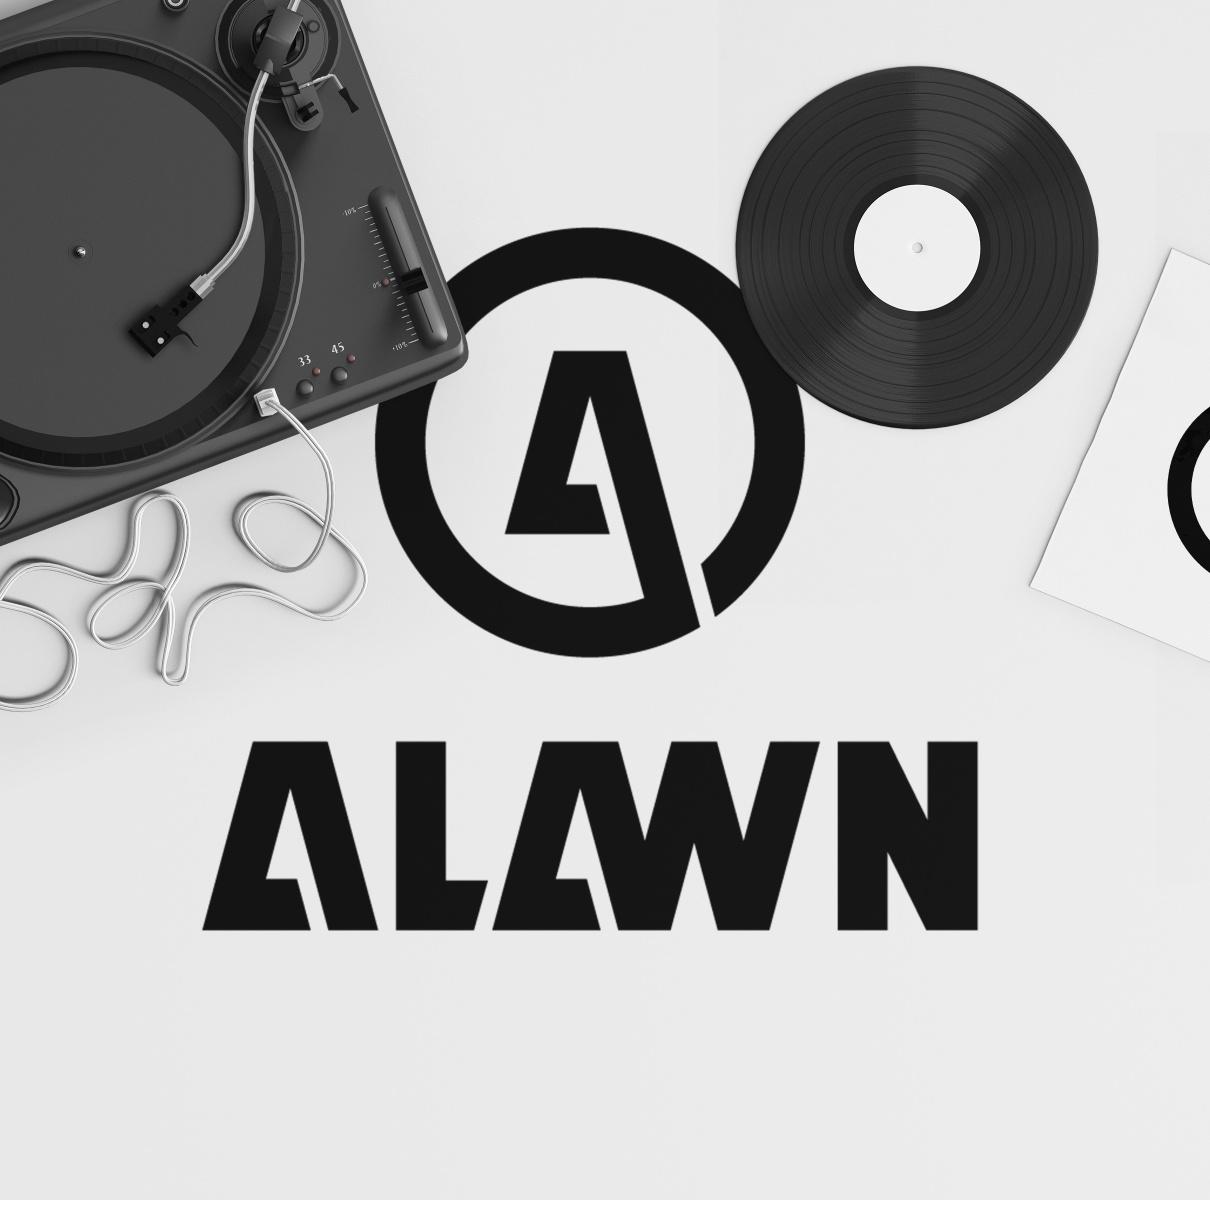 deejay logo design  15 DJ logos that raise the roof - 99designs